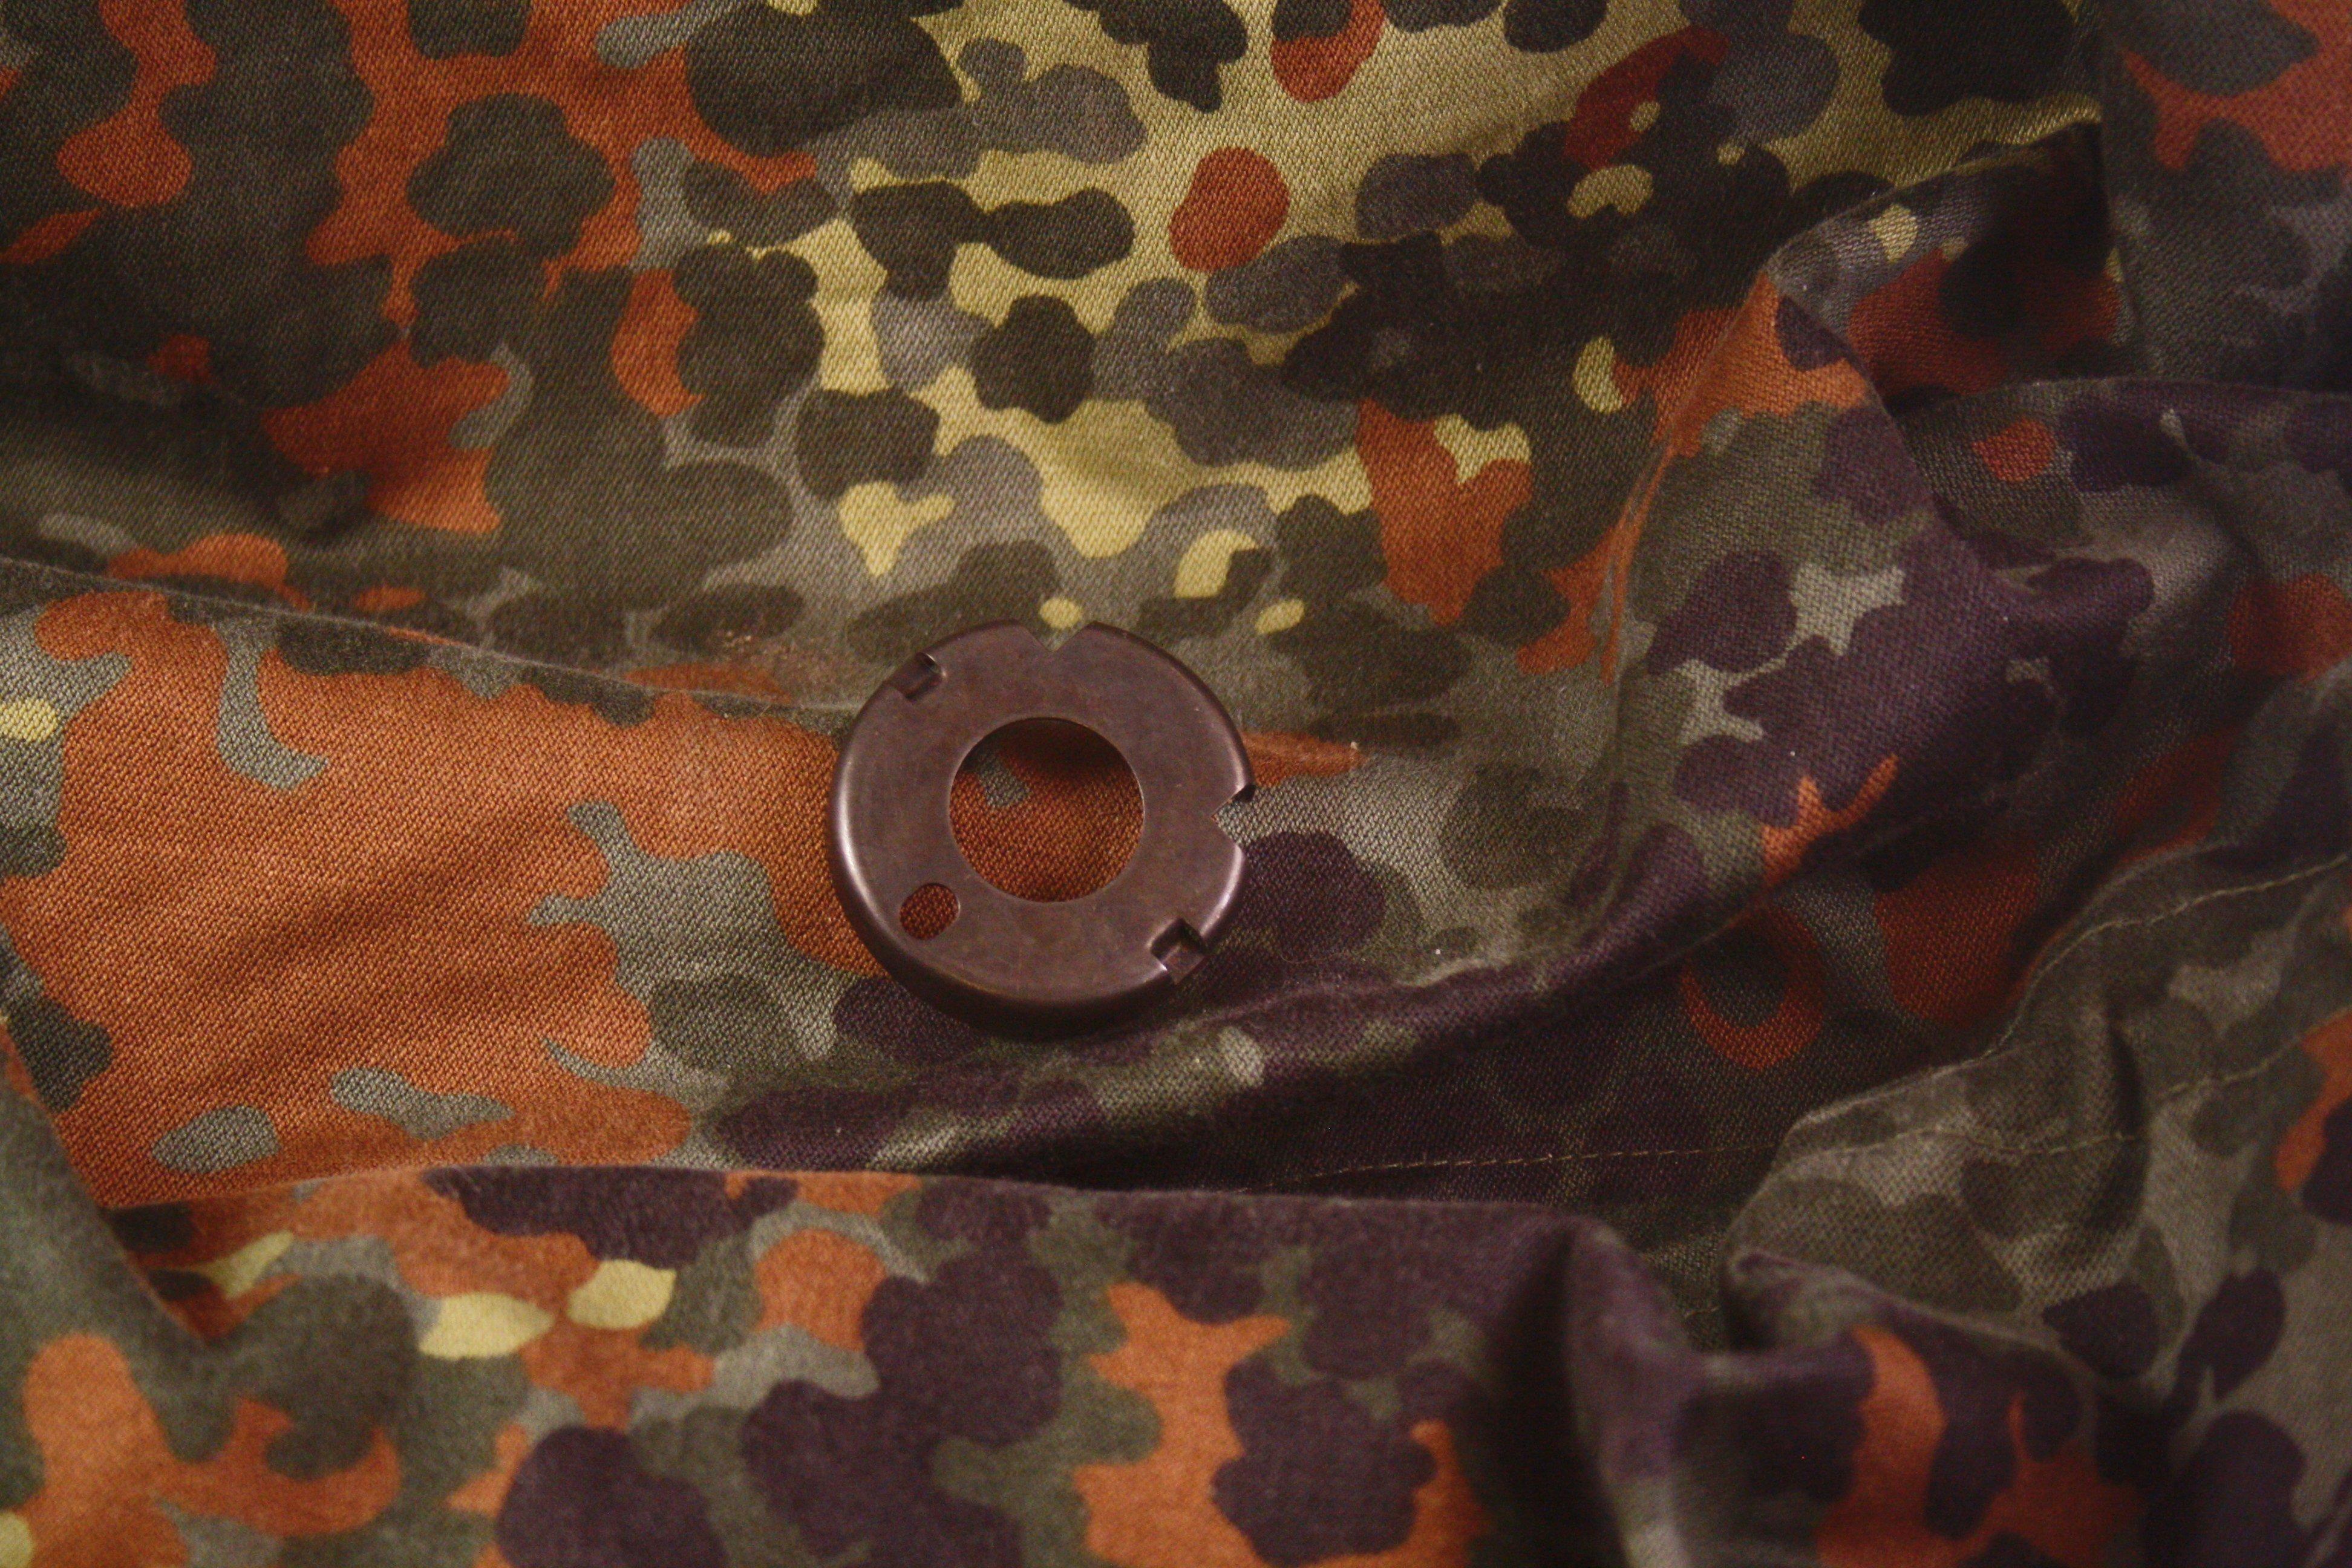 Element handguard cap